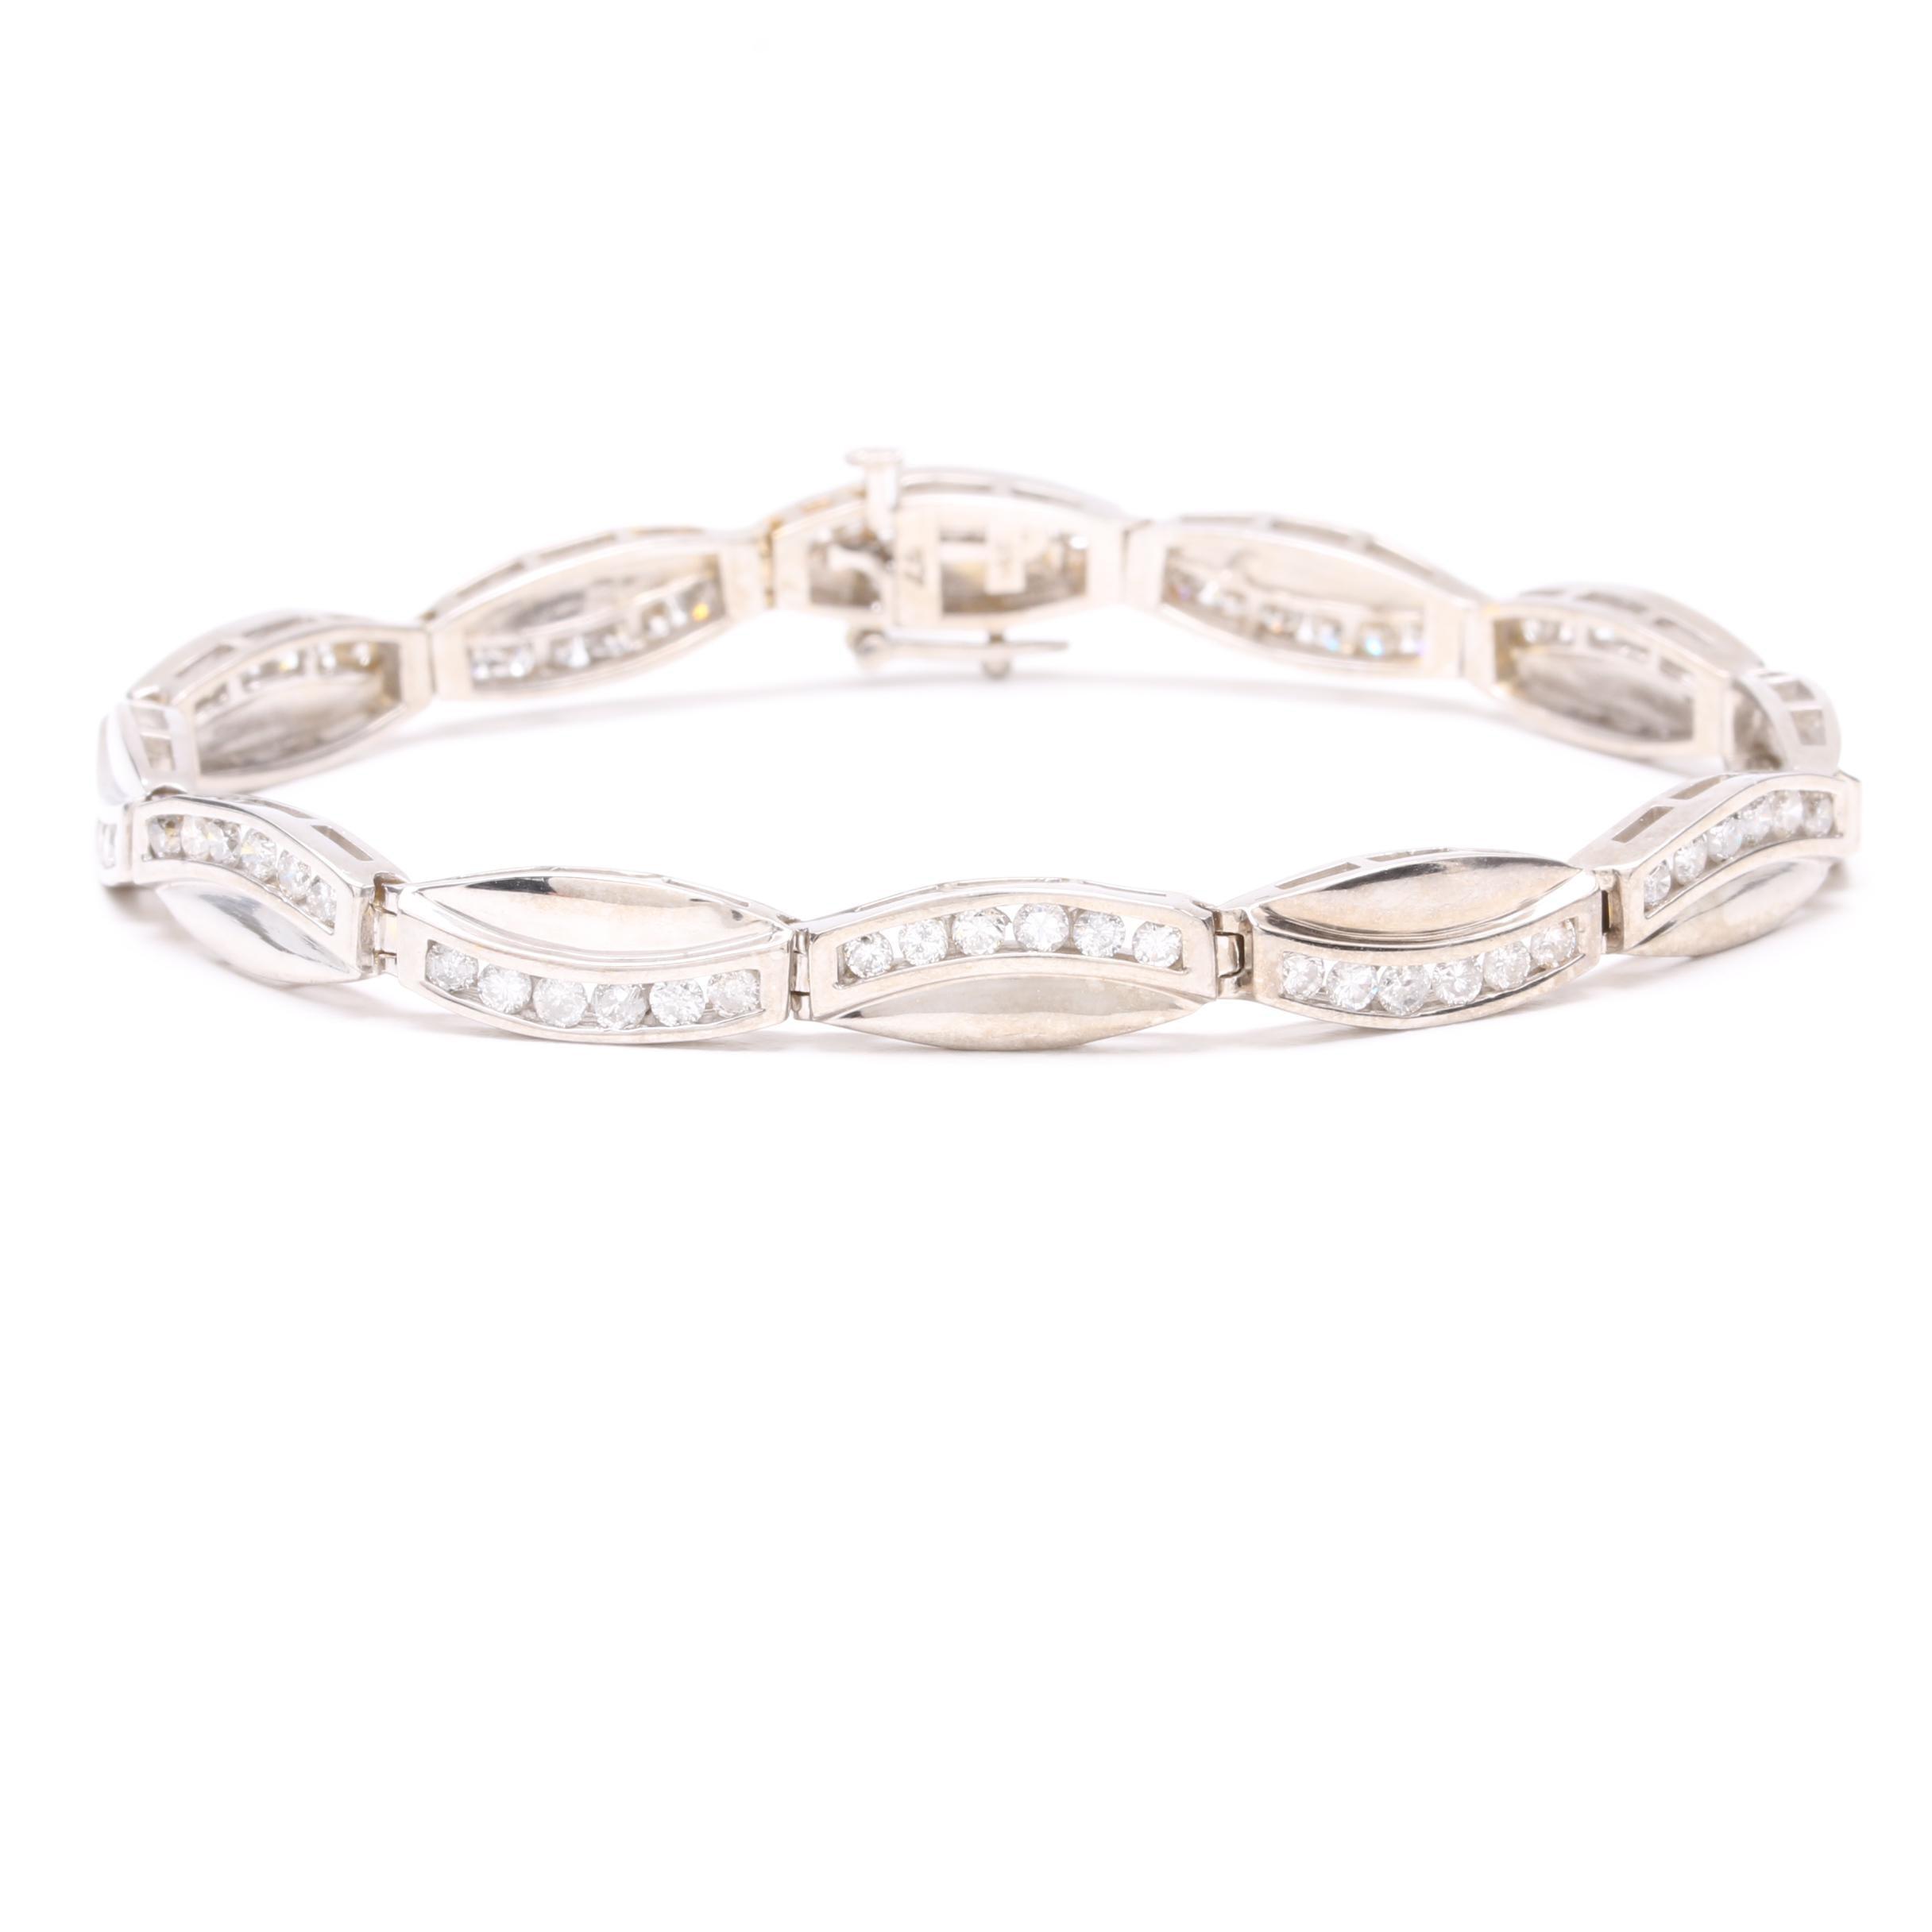 14K White Gold 2.07 CTW Diamond Bracelet